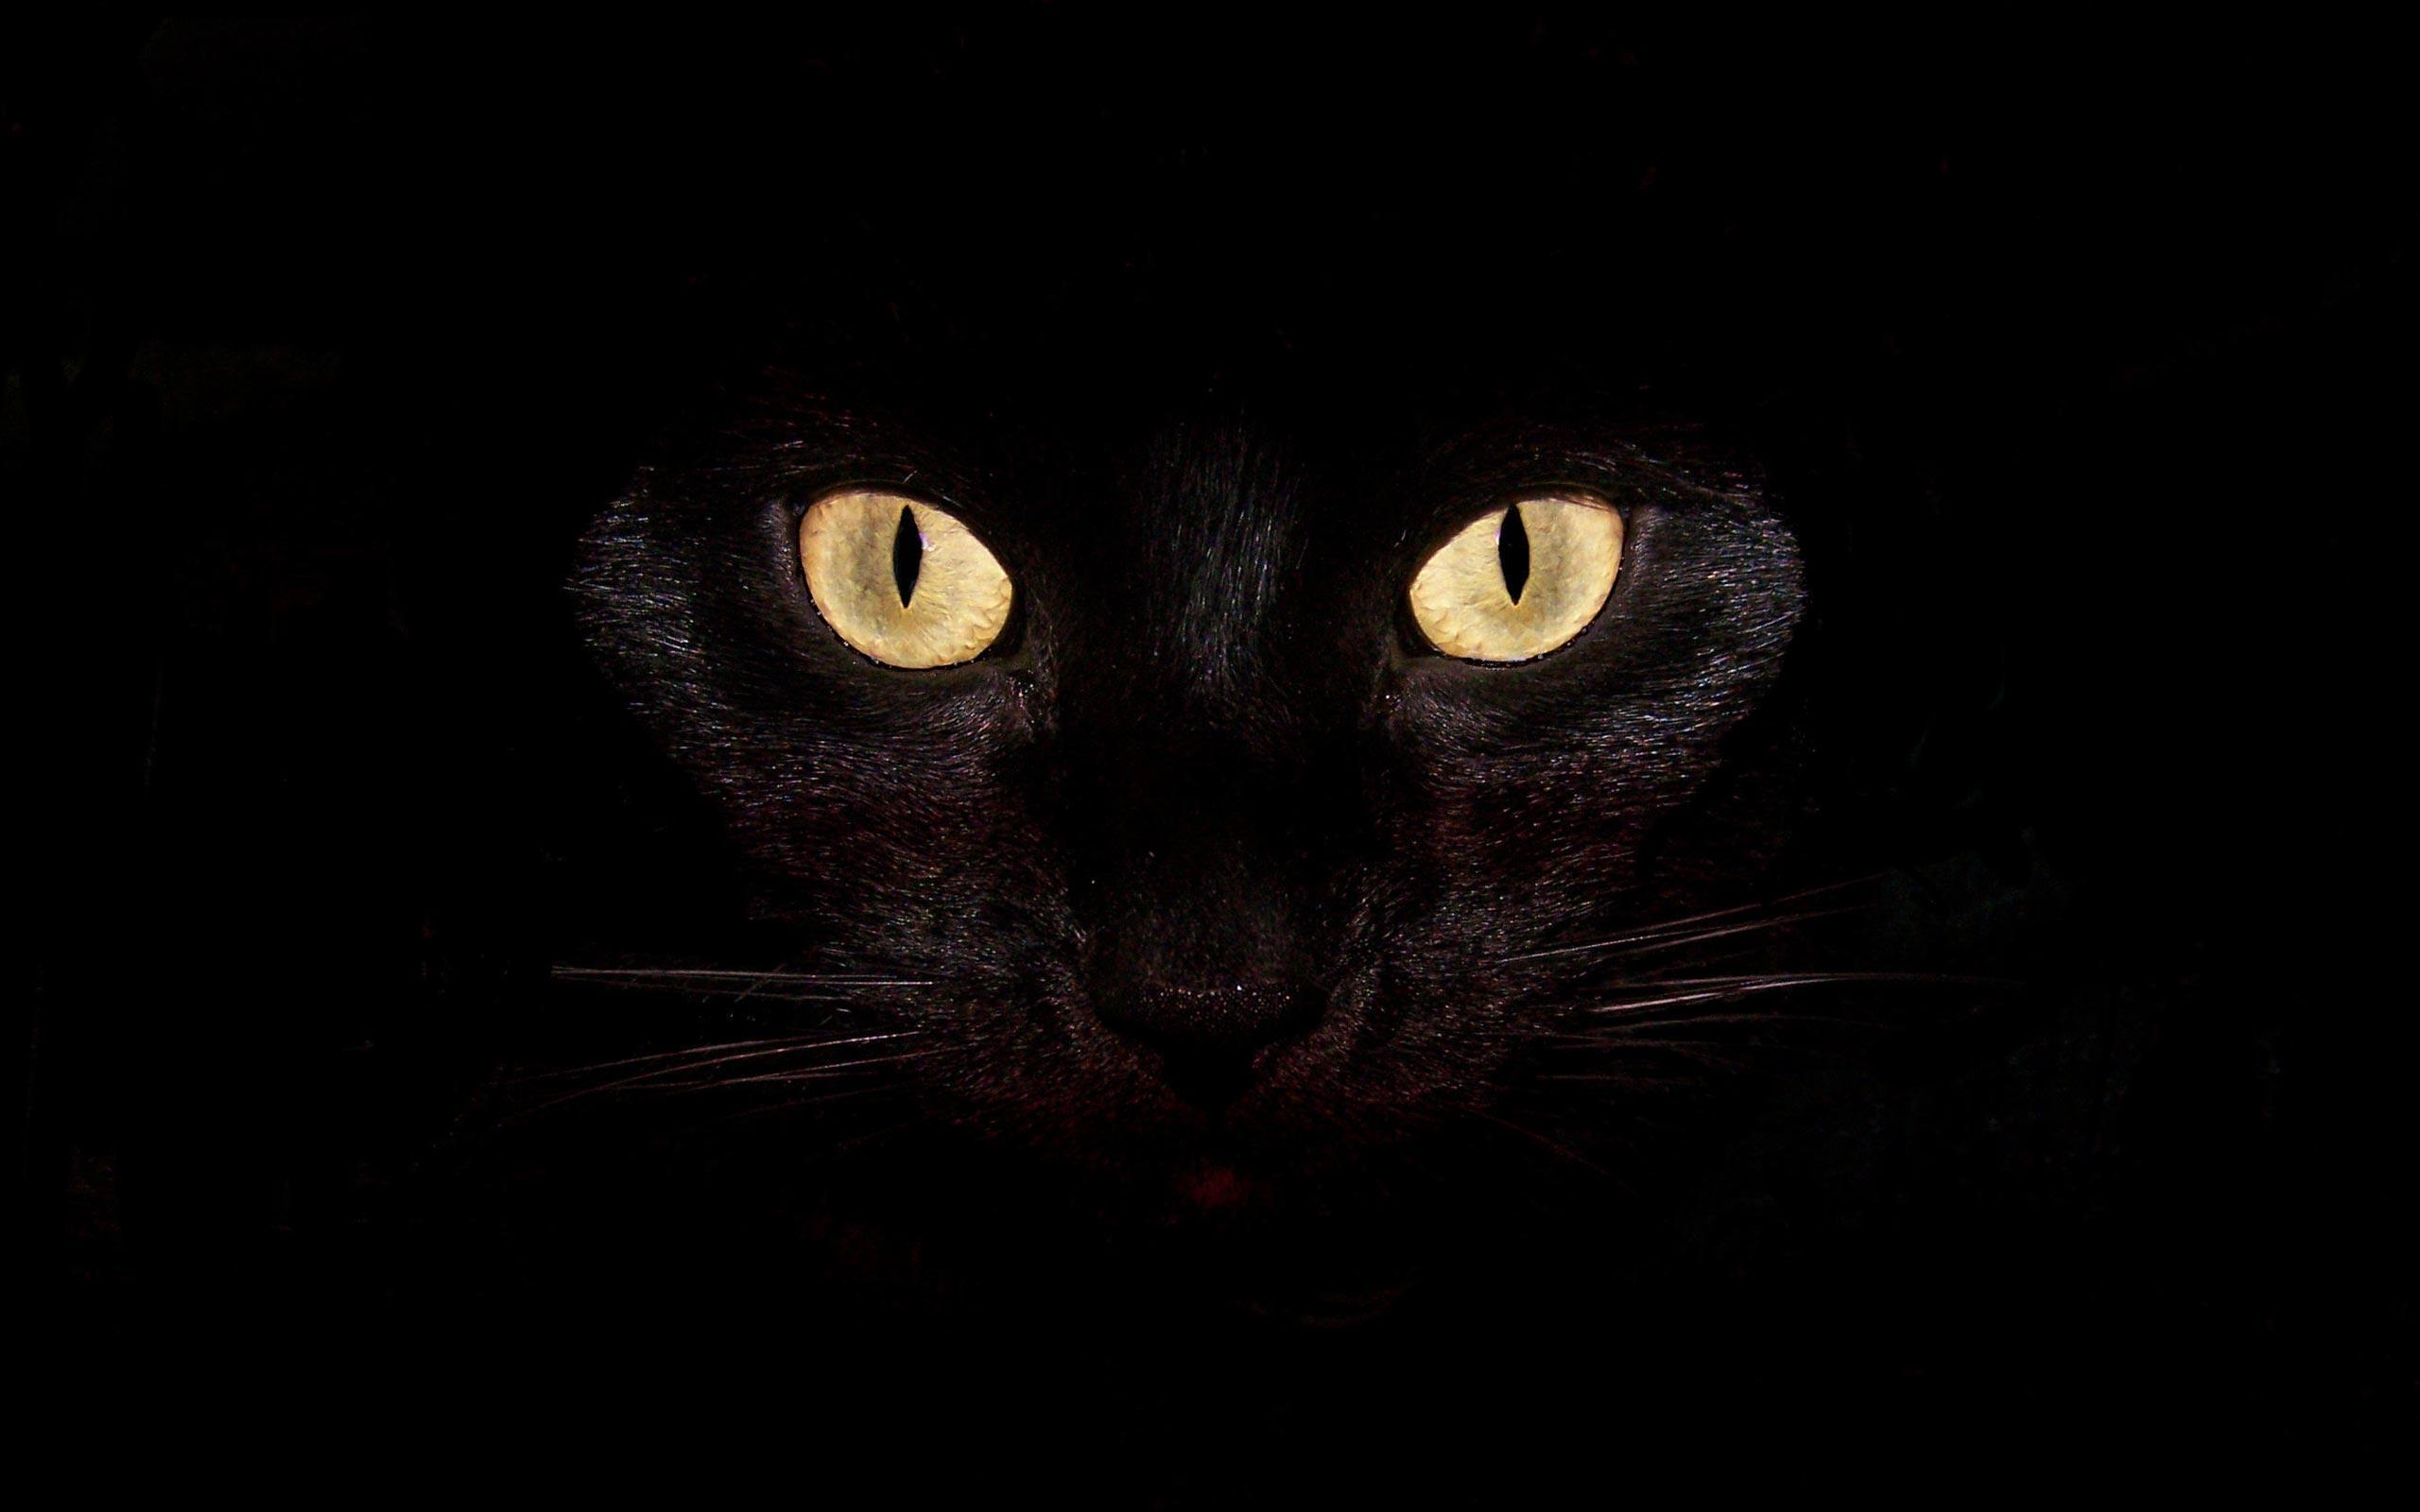 animal black cat background